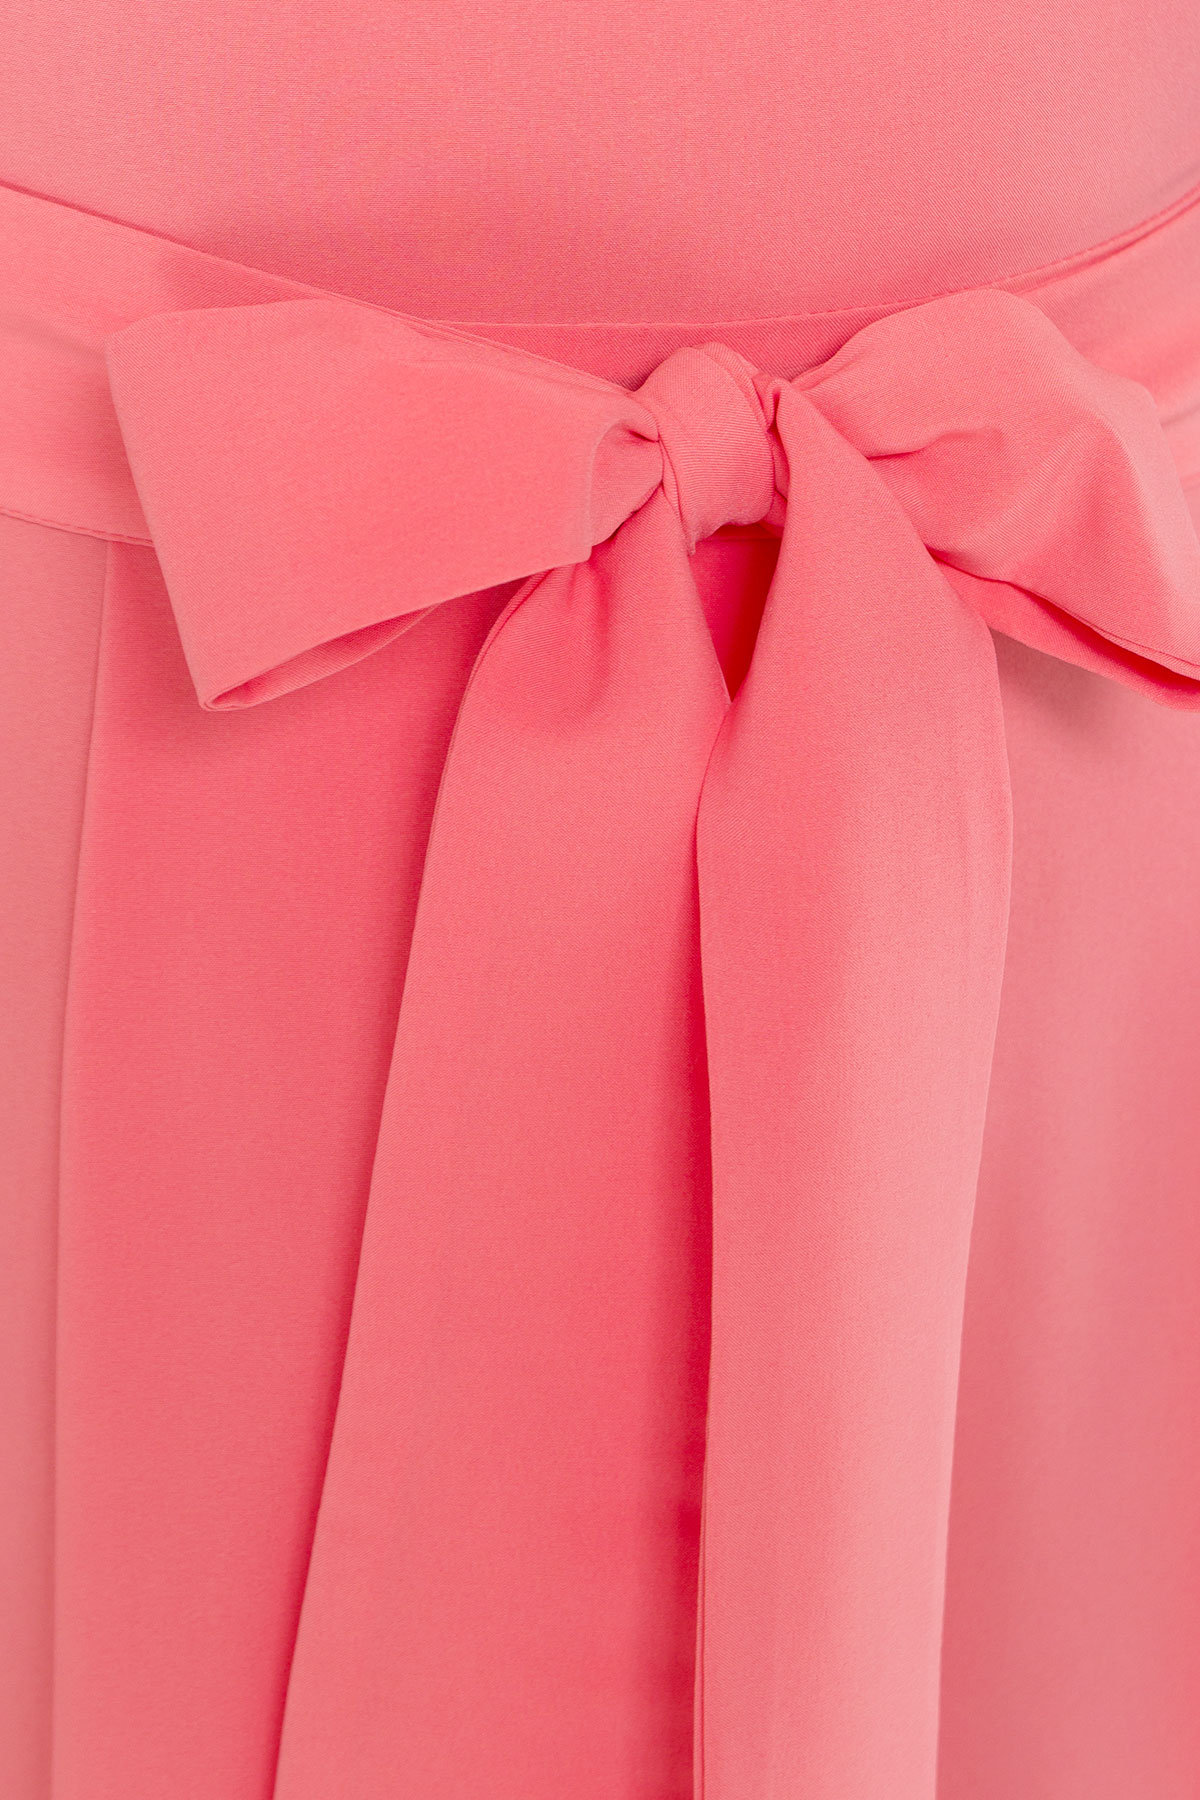 Платье Жадор миди 2929 АРТ. 15323 Цвет: Коралл - фото 3, интернет магазин tm-modus.ru